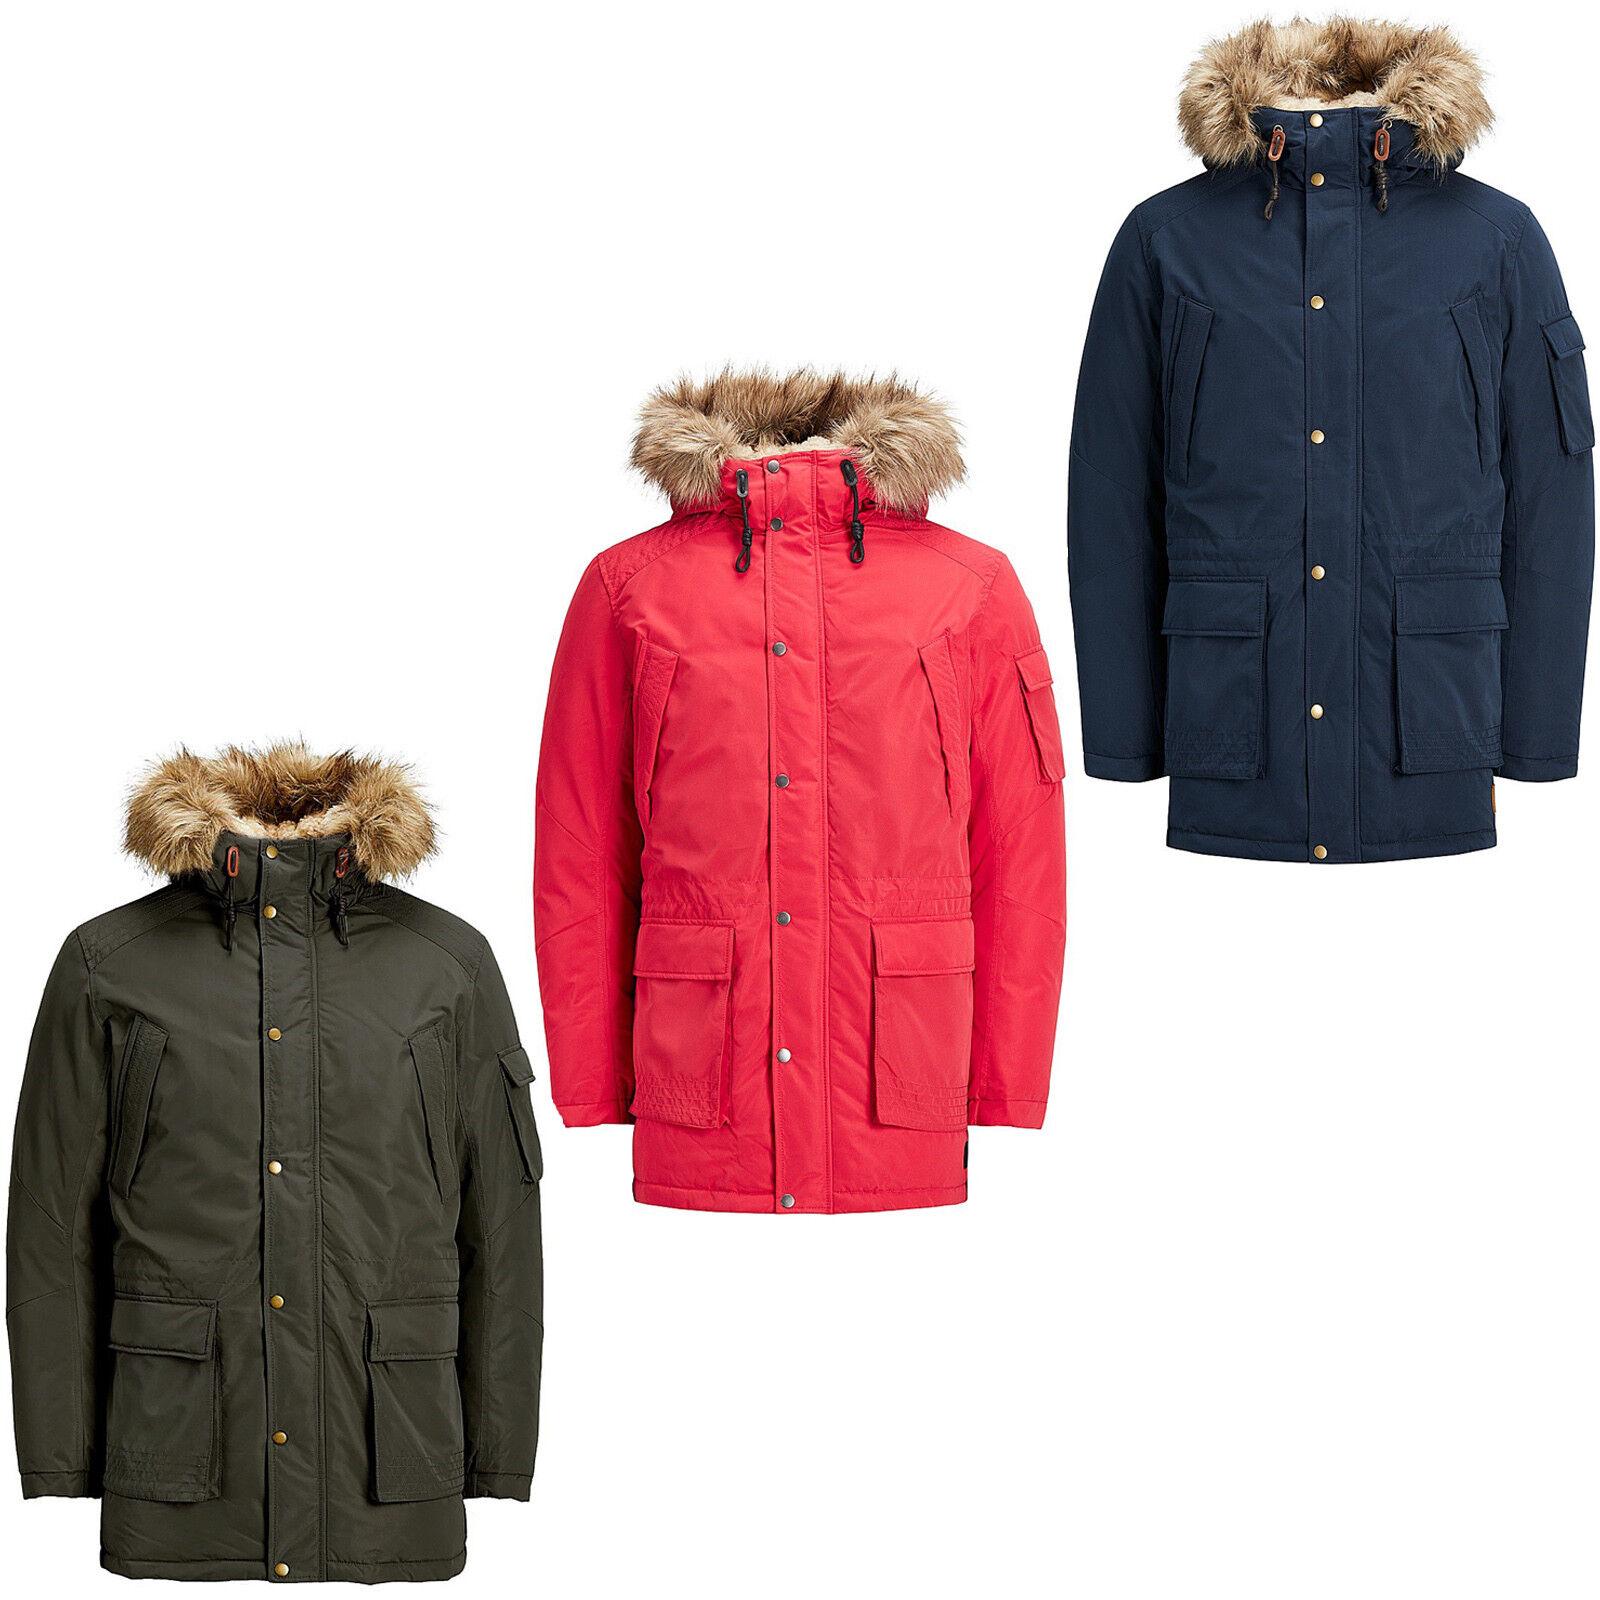 Details about Jack   Jones Originals Parka Jacket Mens Classic Winter  Parker Coat Jorlatte 1c01400db4f